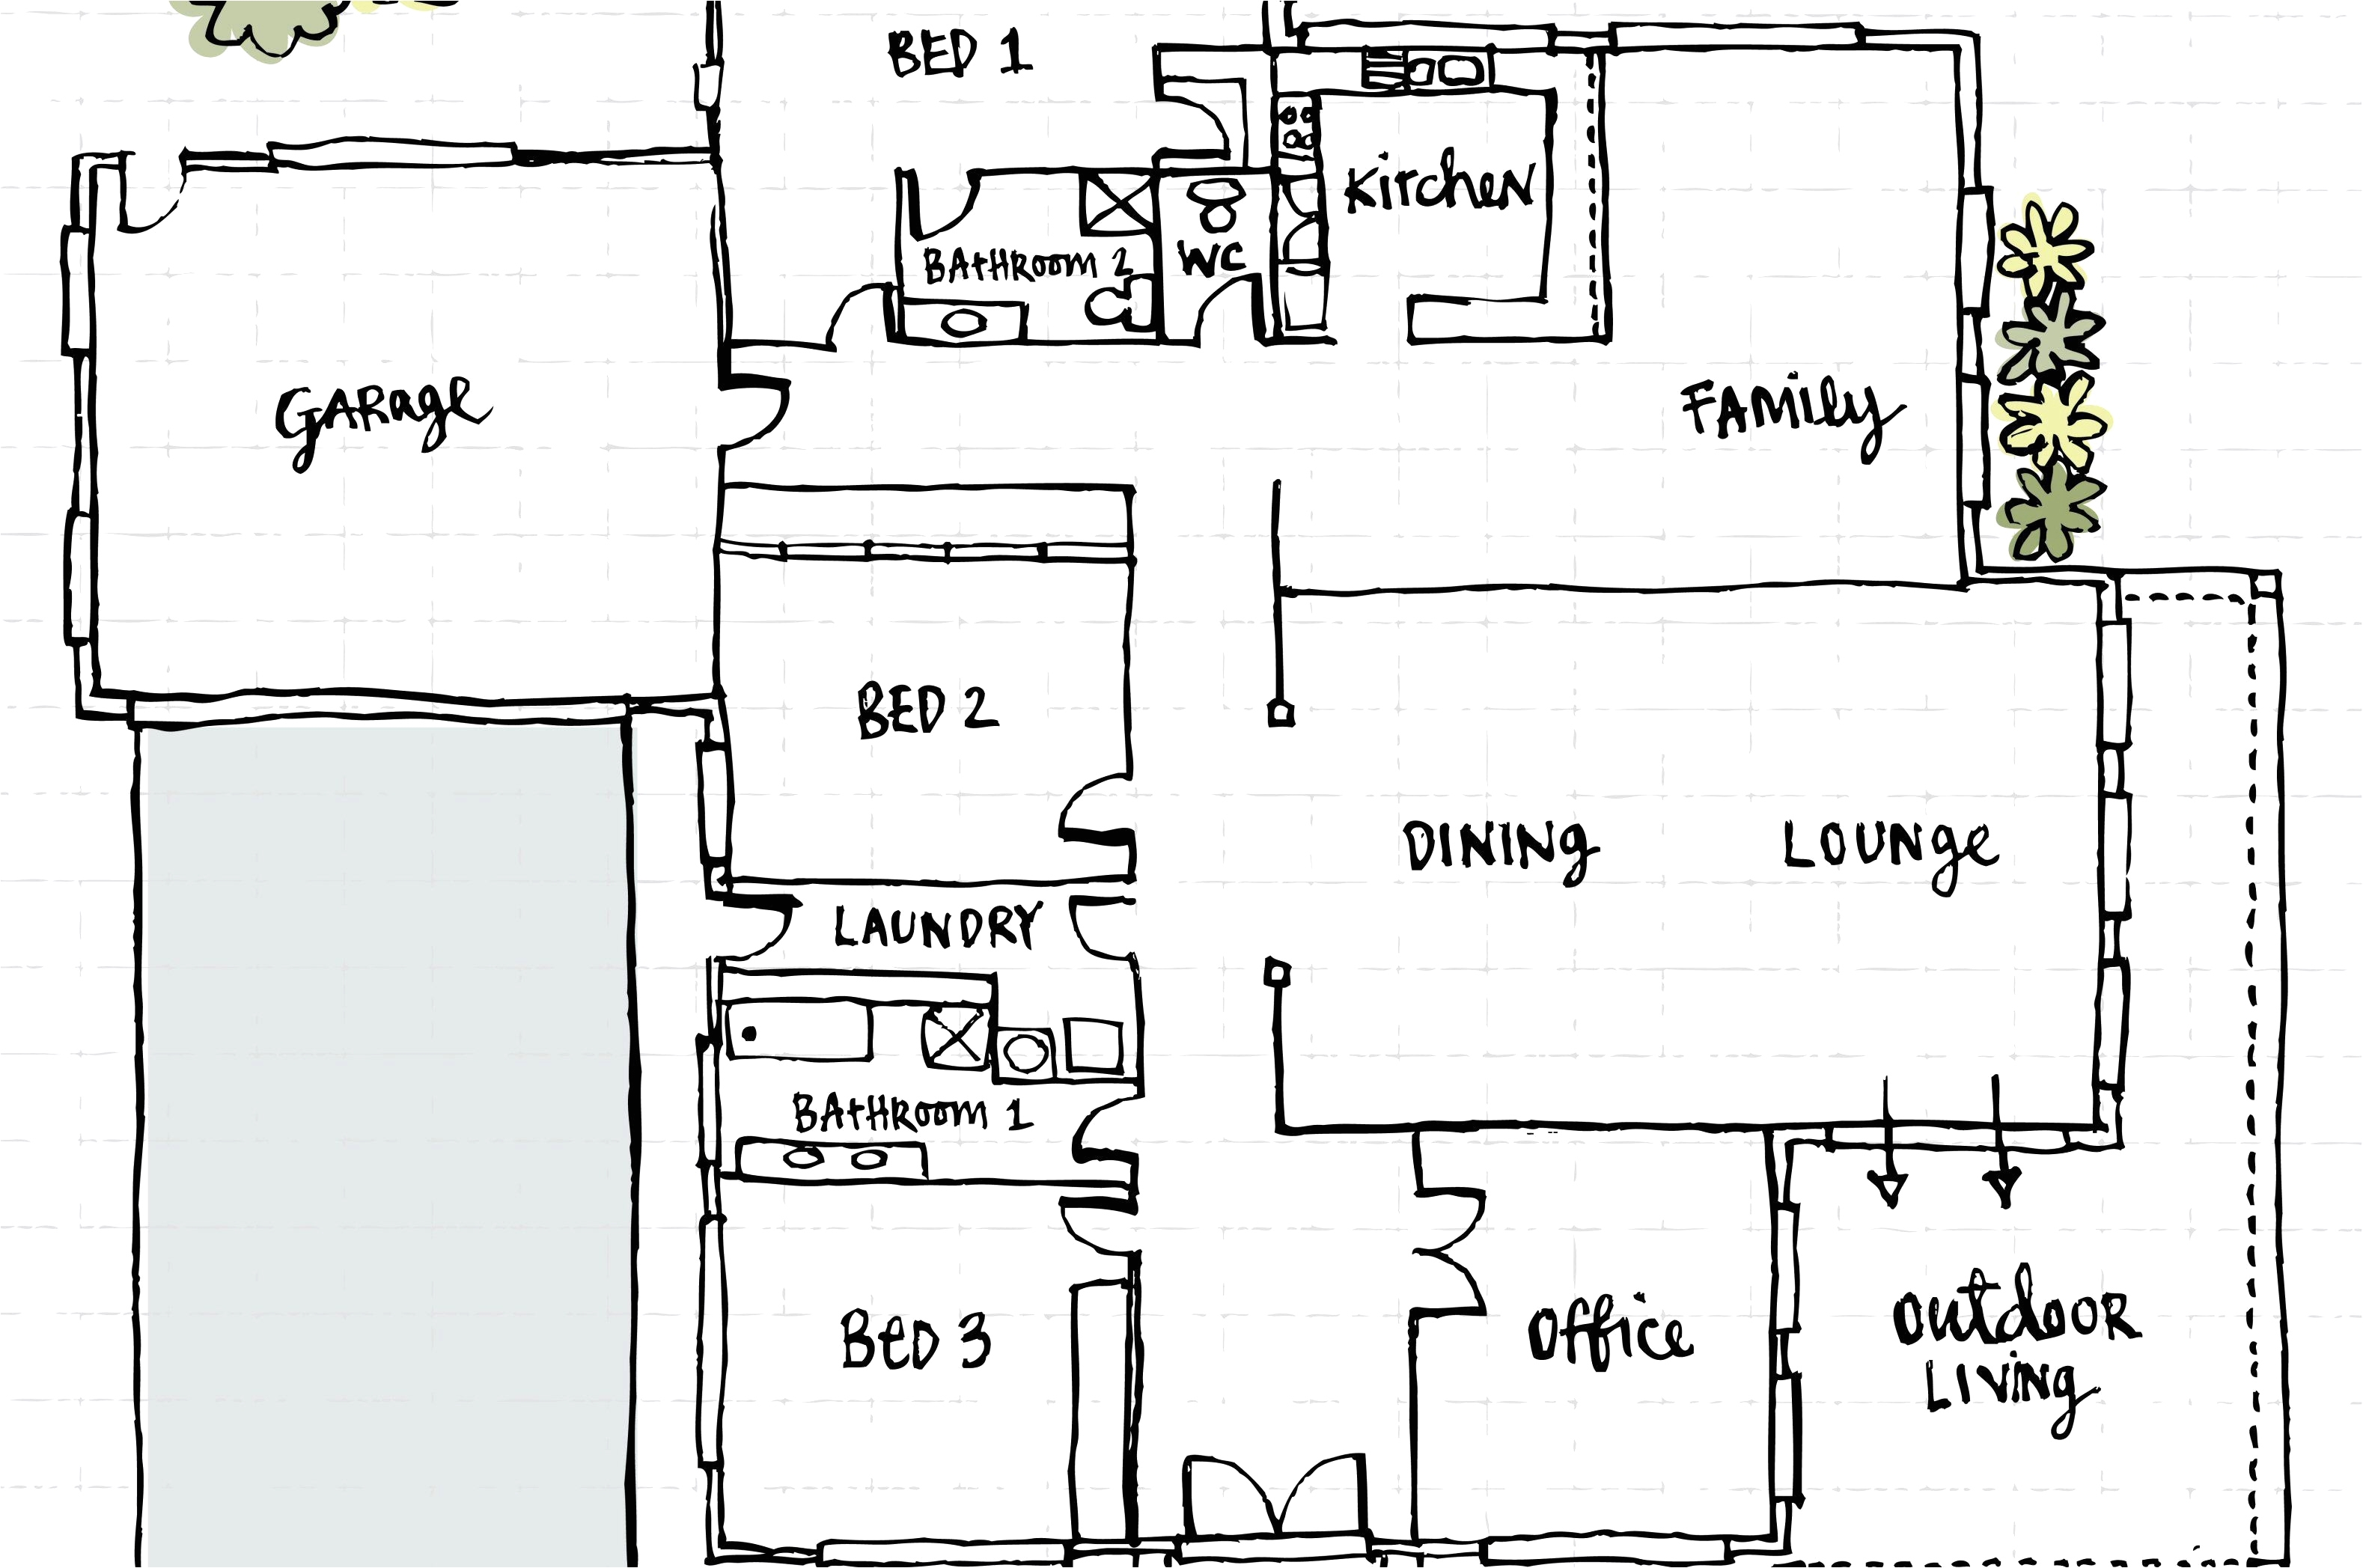 51 beautiful gallery of 2 bedroom rv floor plans